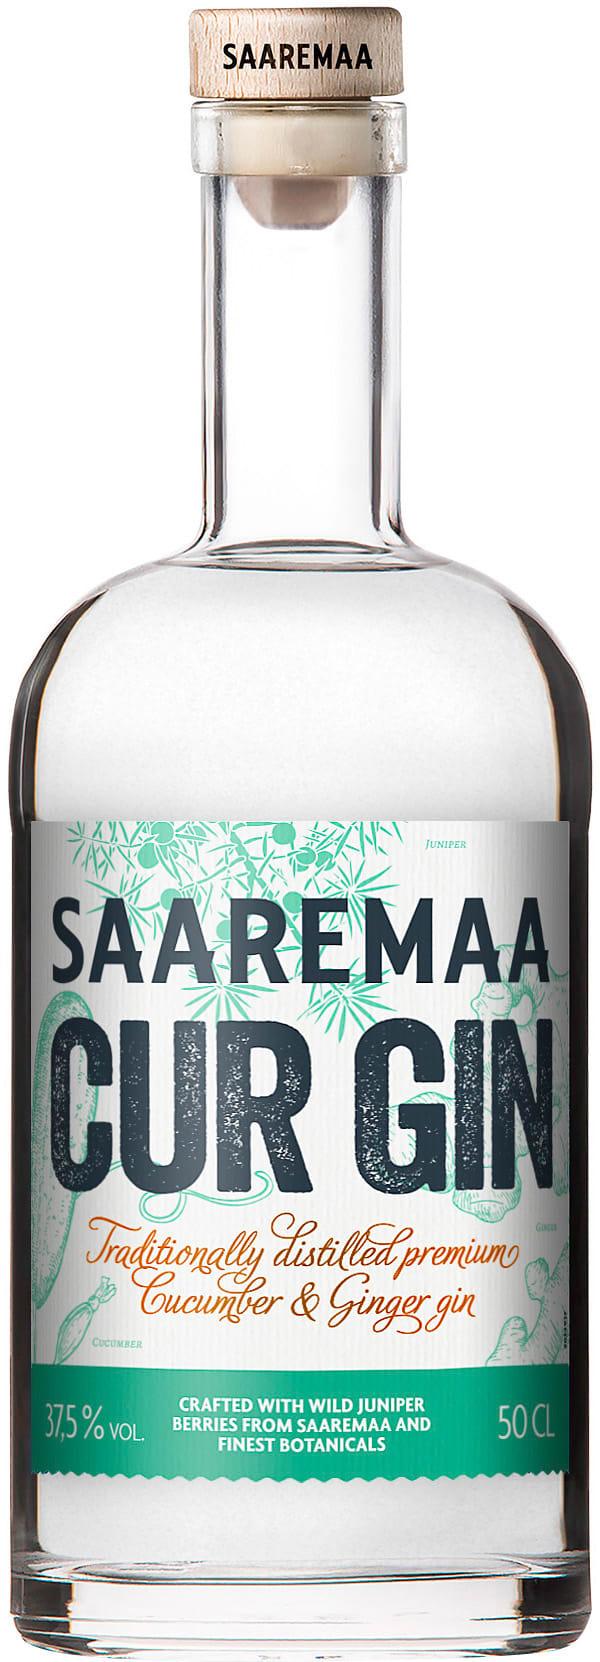 Saaremaa Cucumber & Ginger Gin